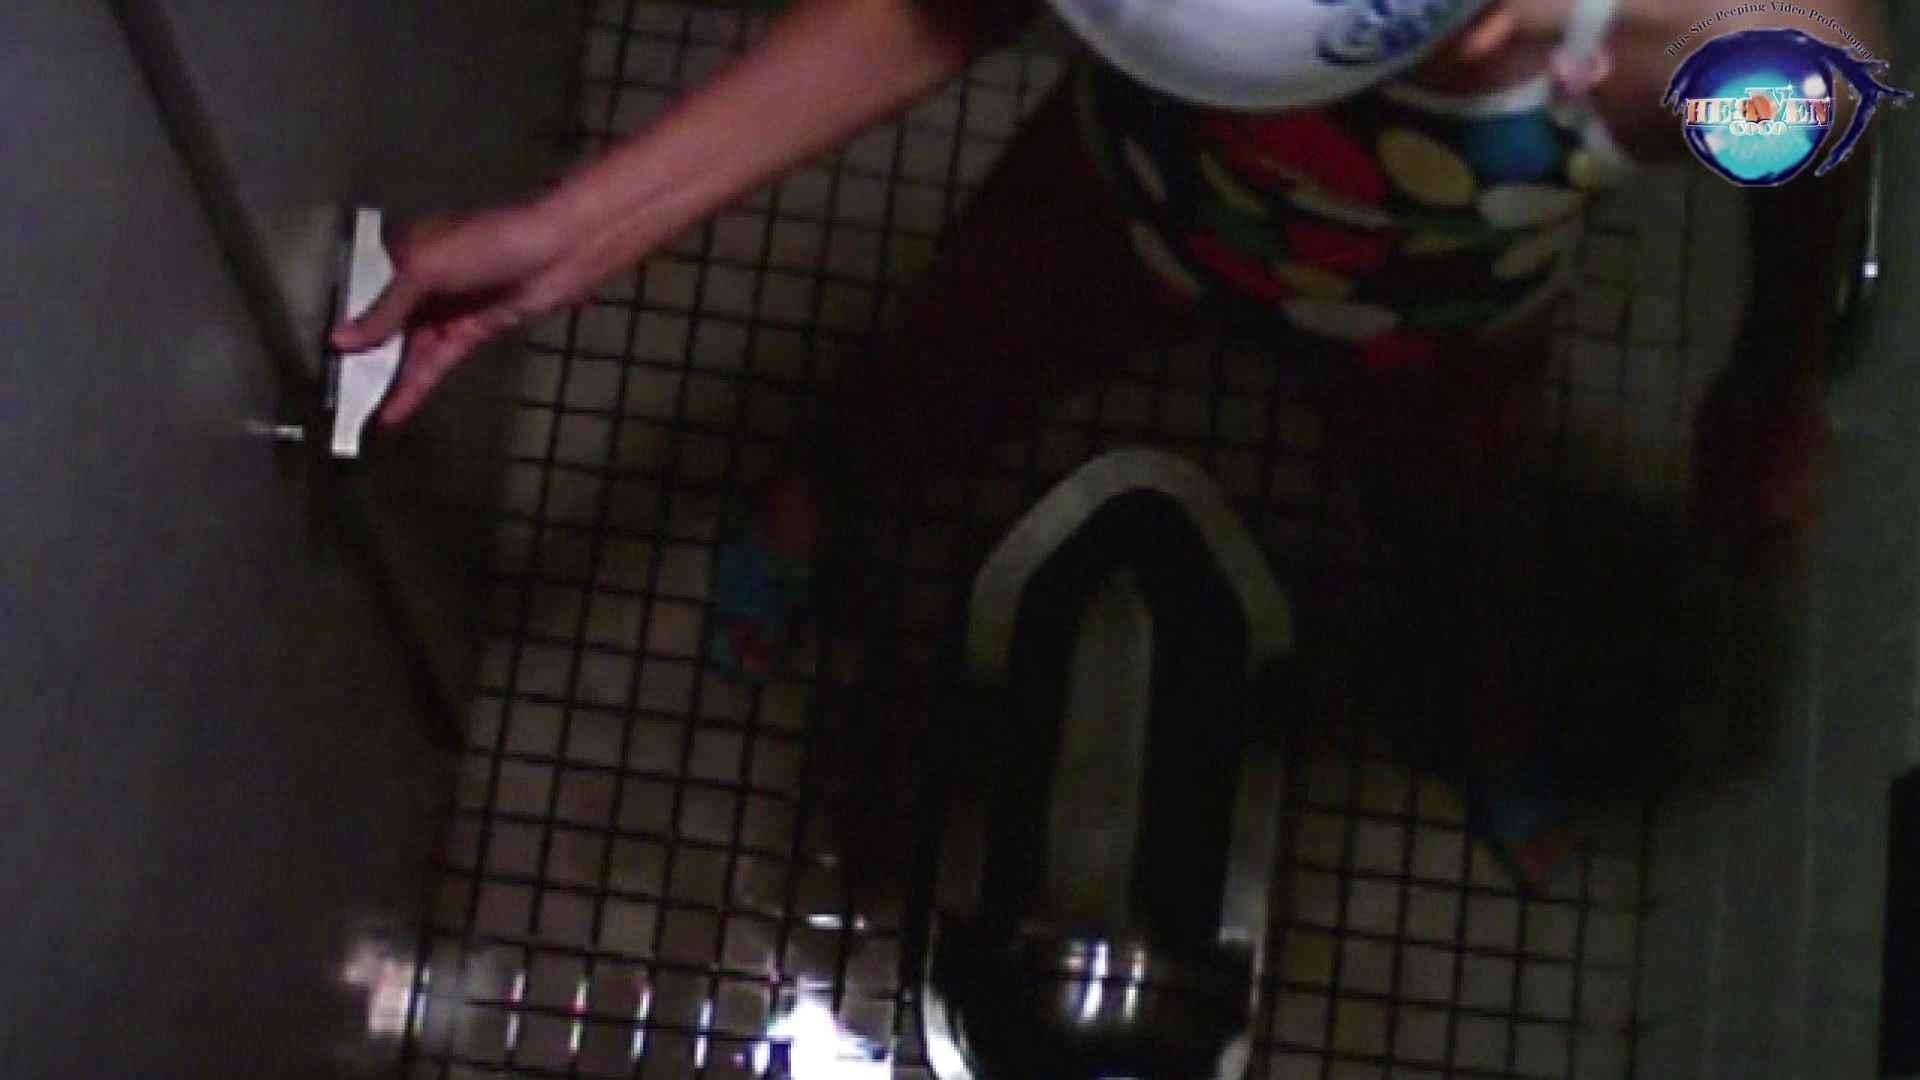 水泳大会選手の聖水 vol.09 全裸 オマンコ無修正動画無料 85pic 4